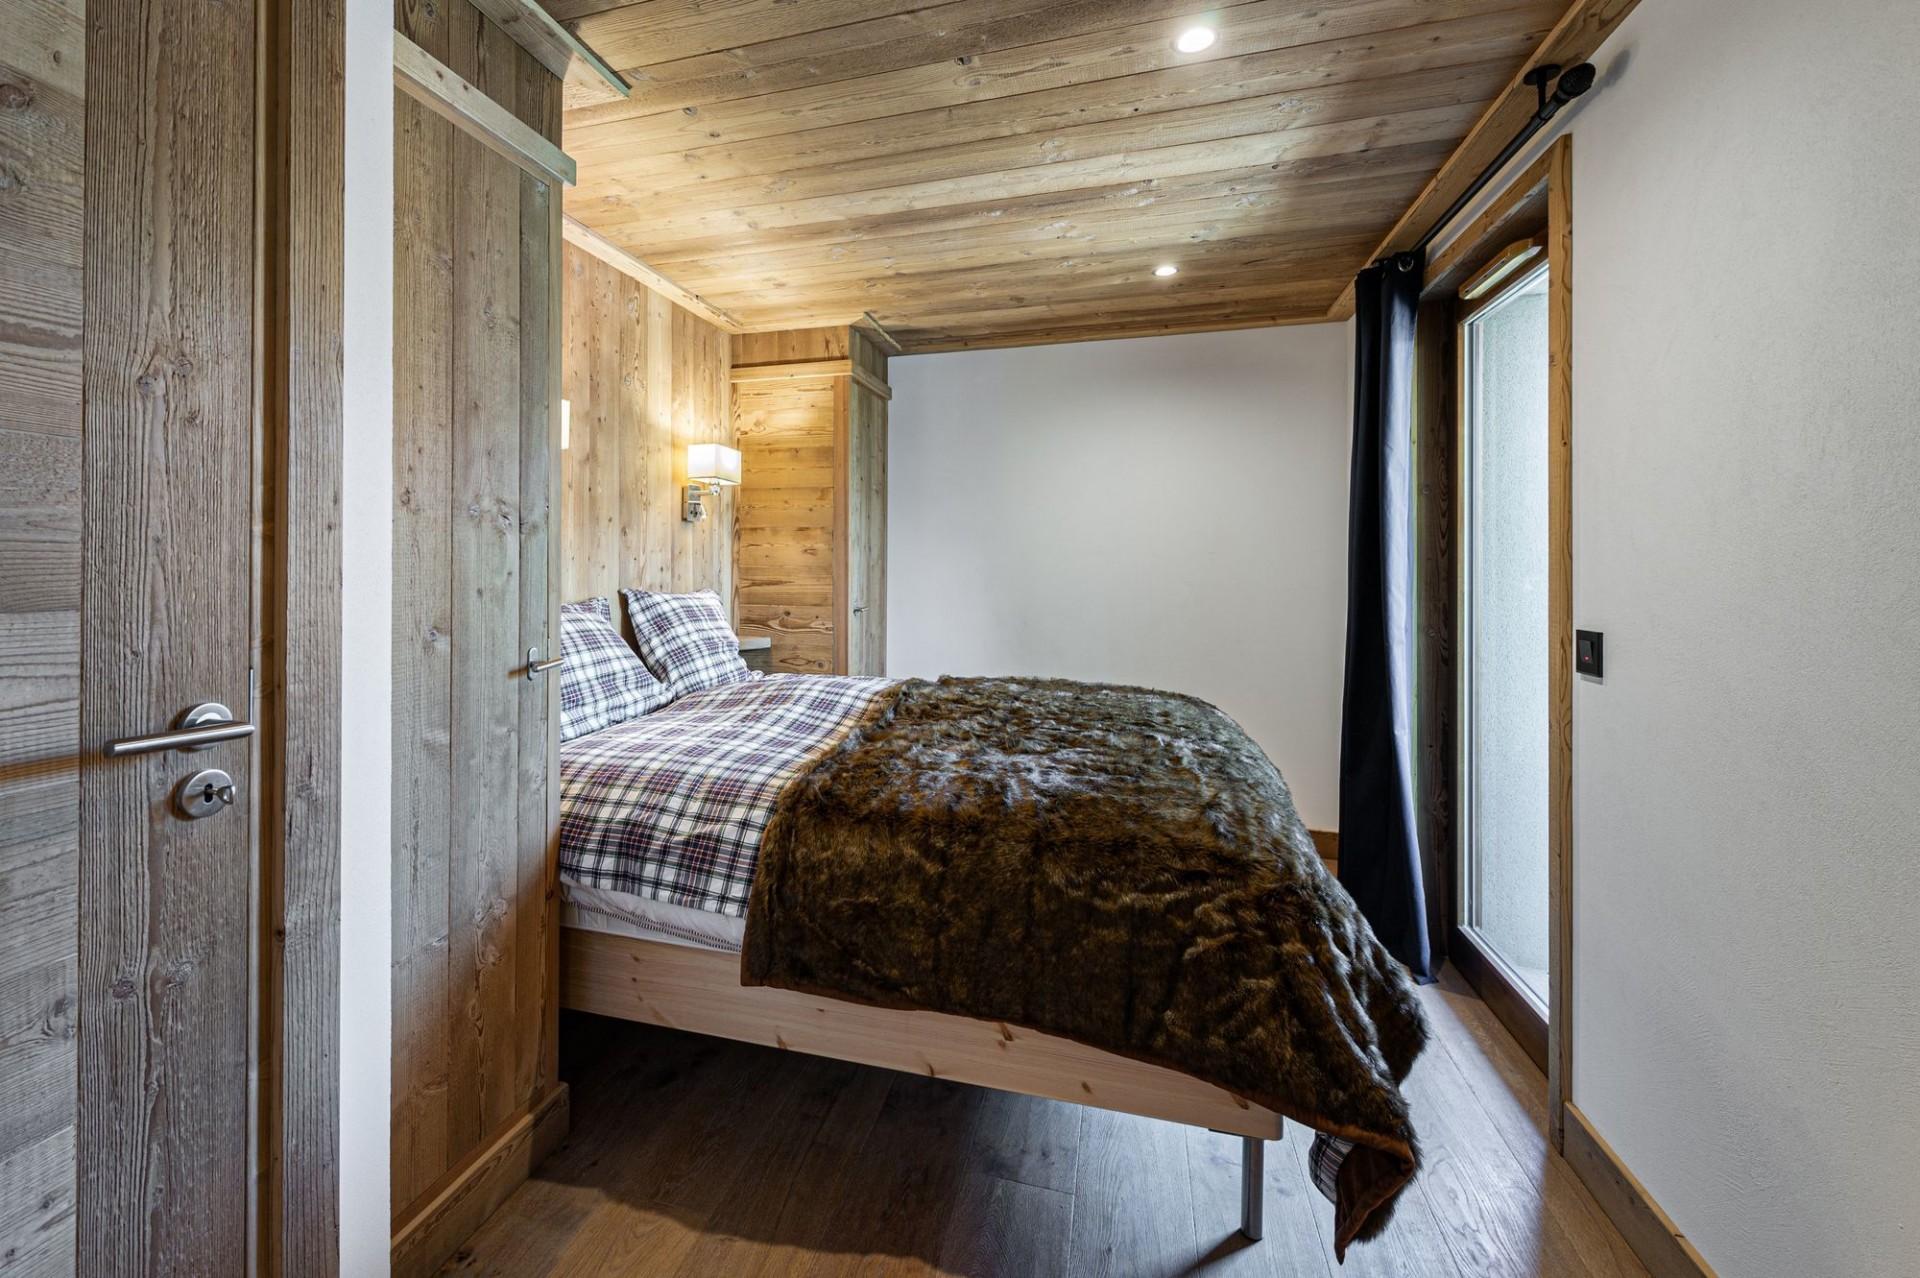 Courchevel 1300 Luxury Rental Appartment Tilite Bedroom 2